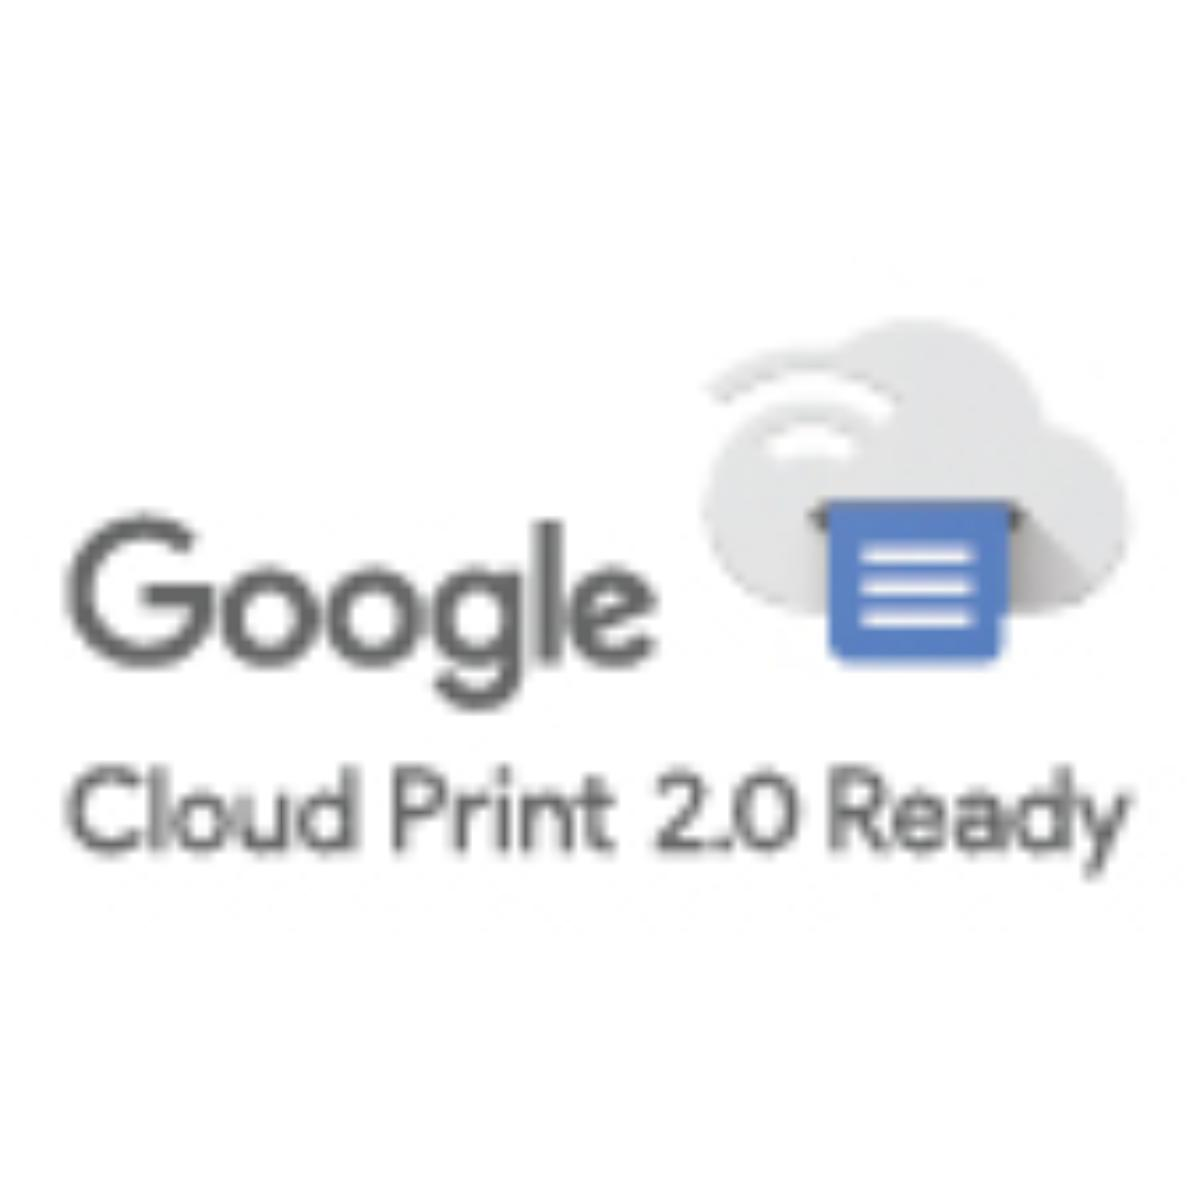 google_cloud_print_-awards-Single-Thumb_awards.jpg